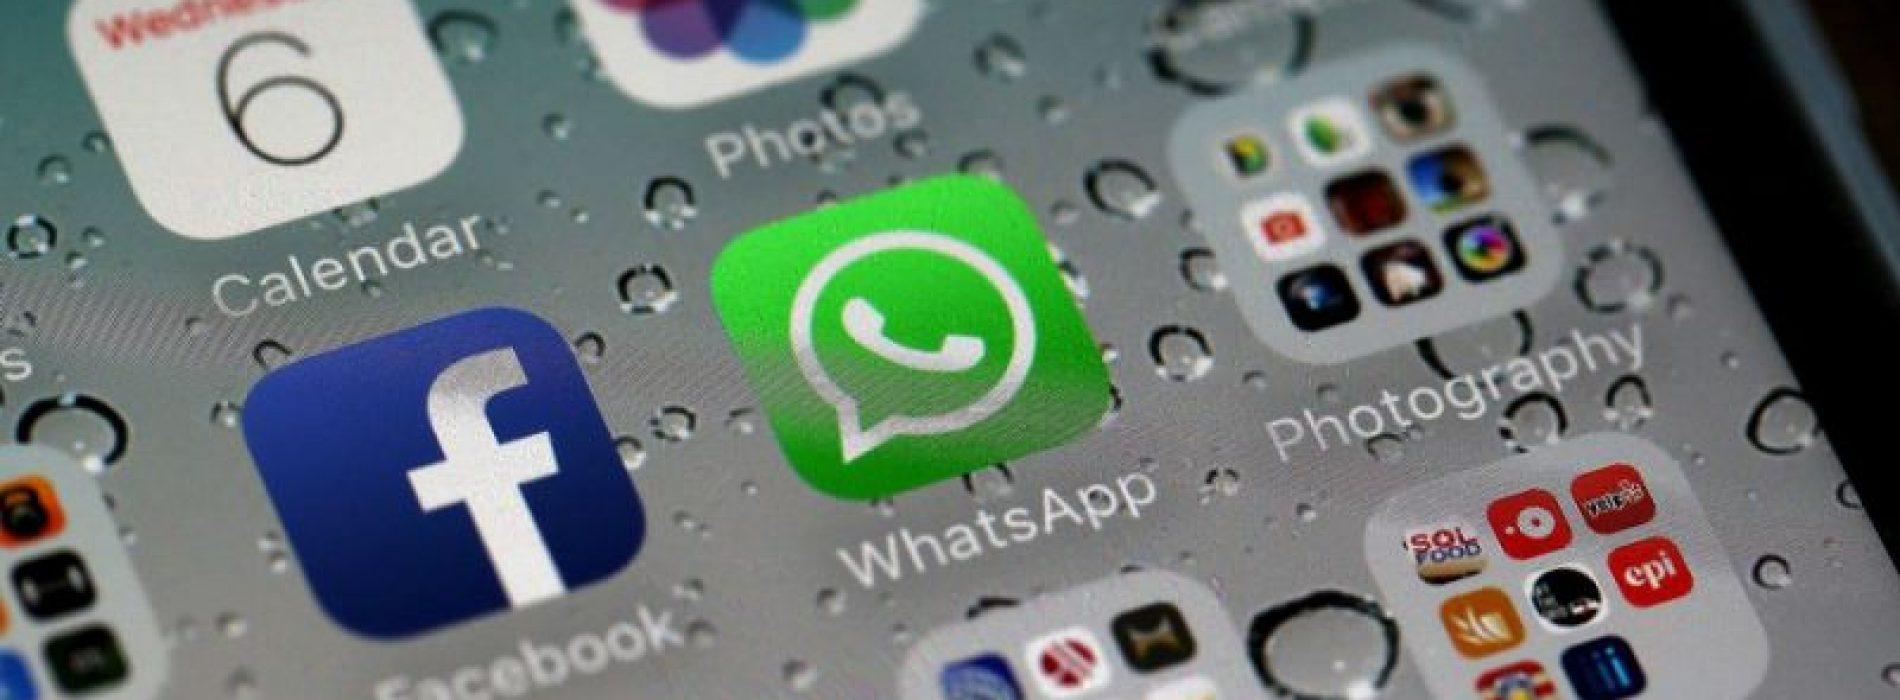 Ülkemizin WhatsApp Destek Sitesi WhatsAppDestek.net